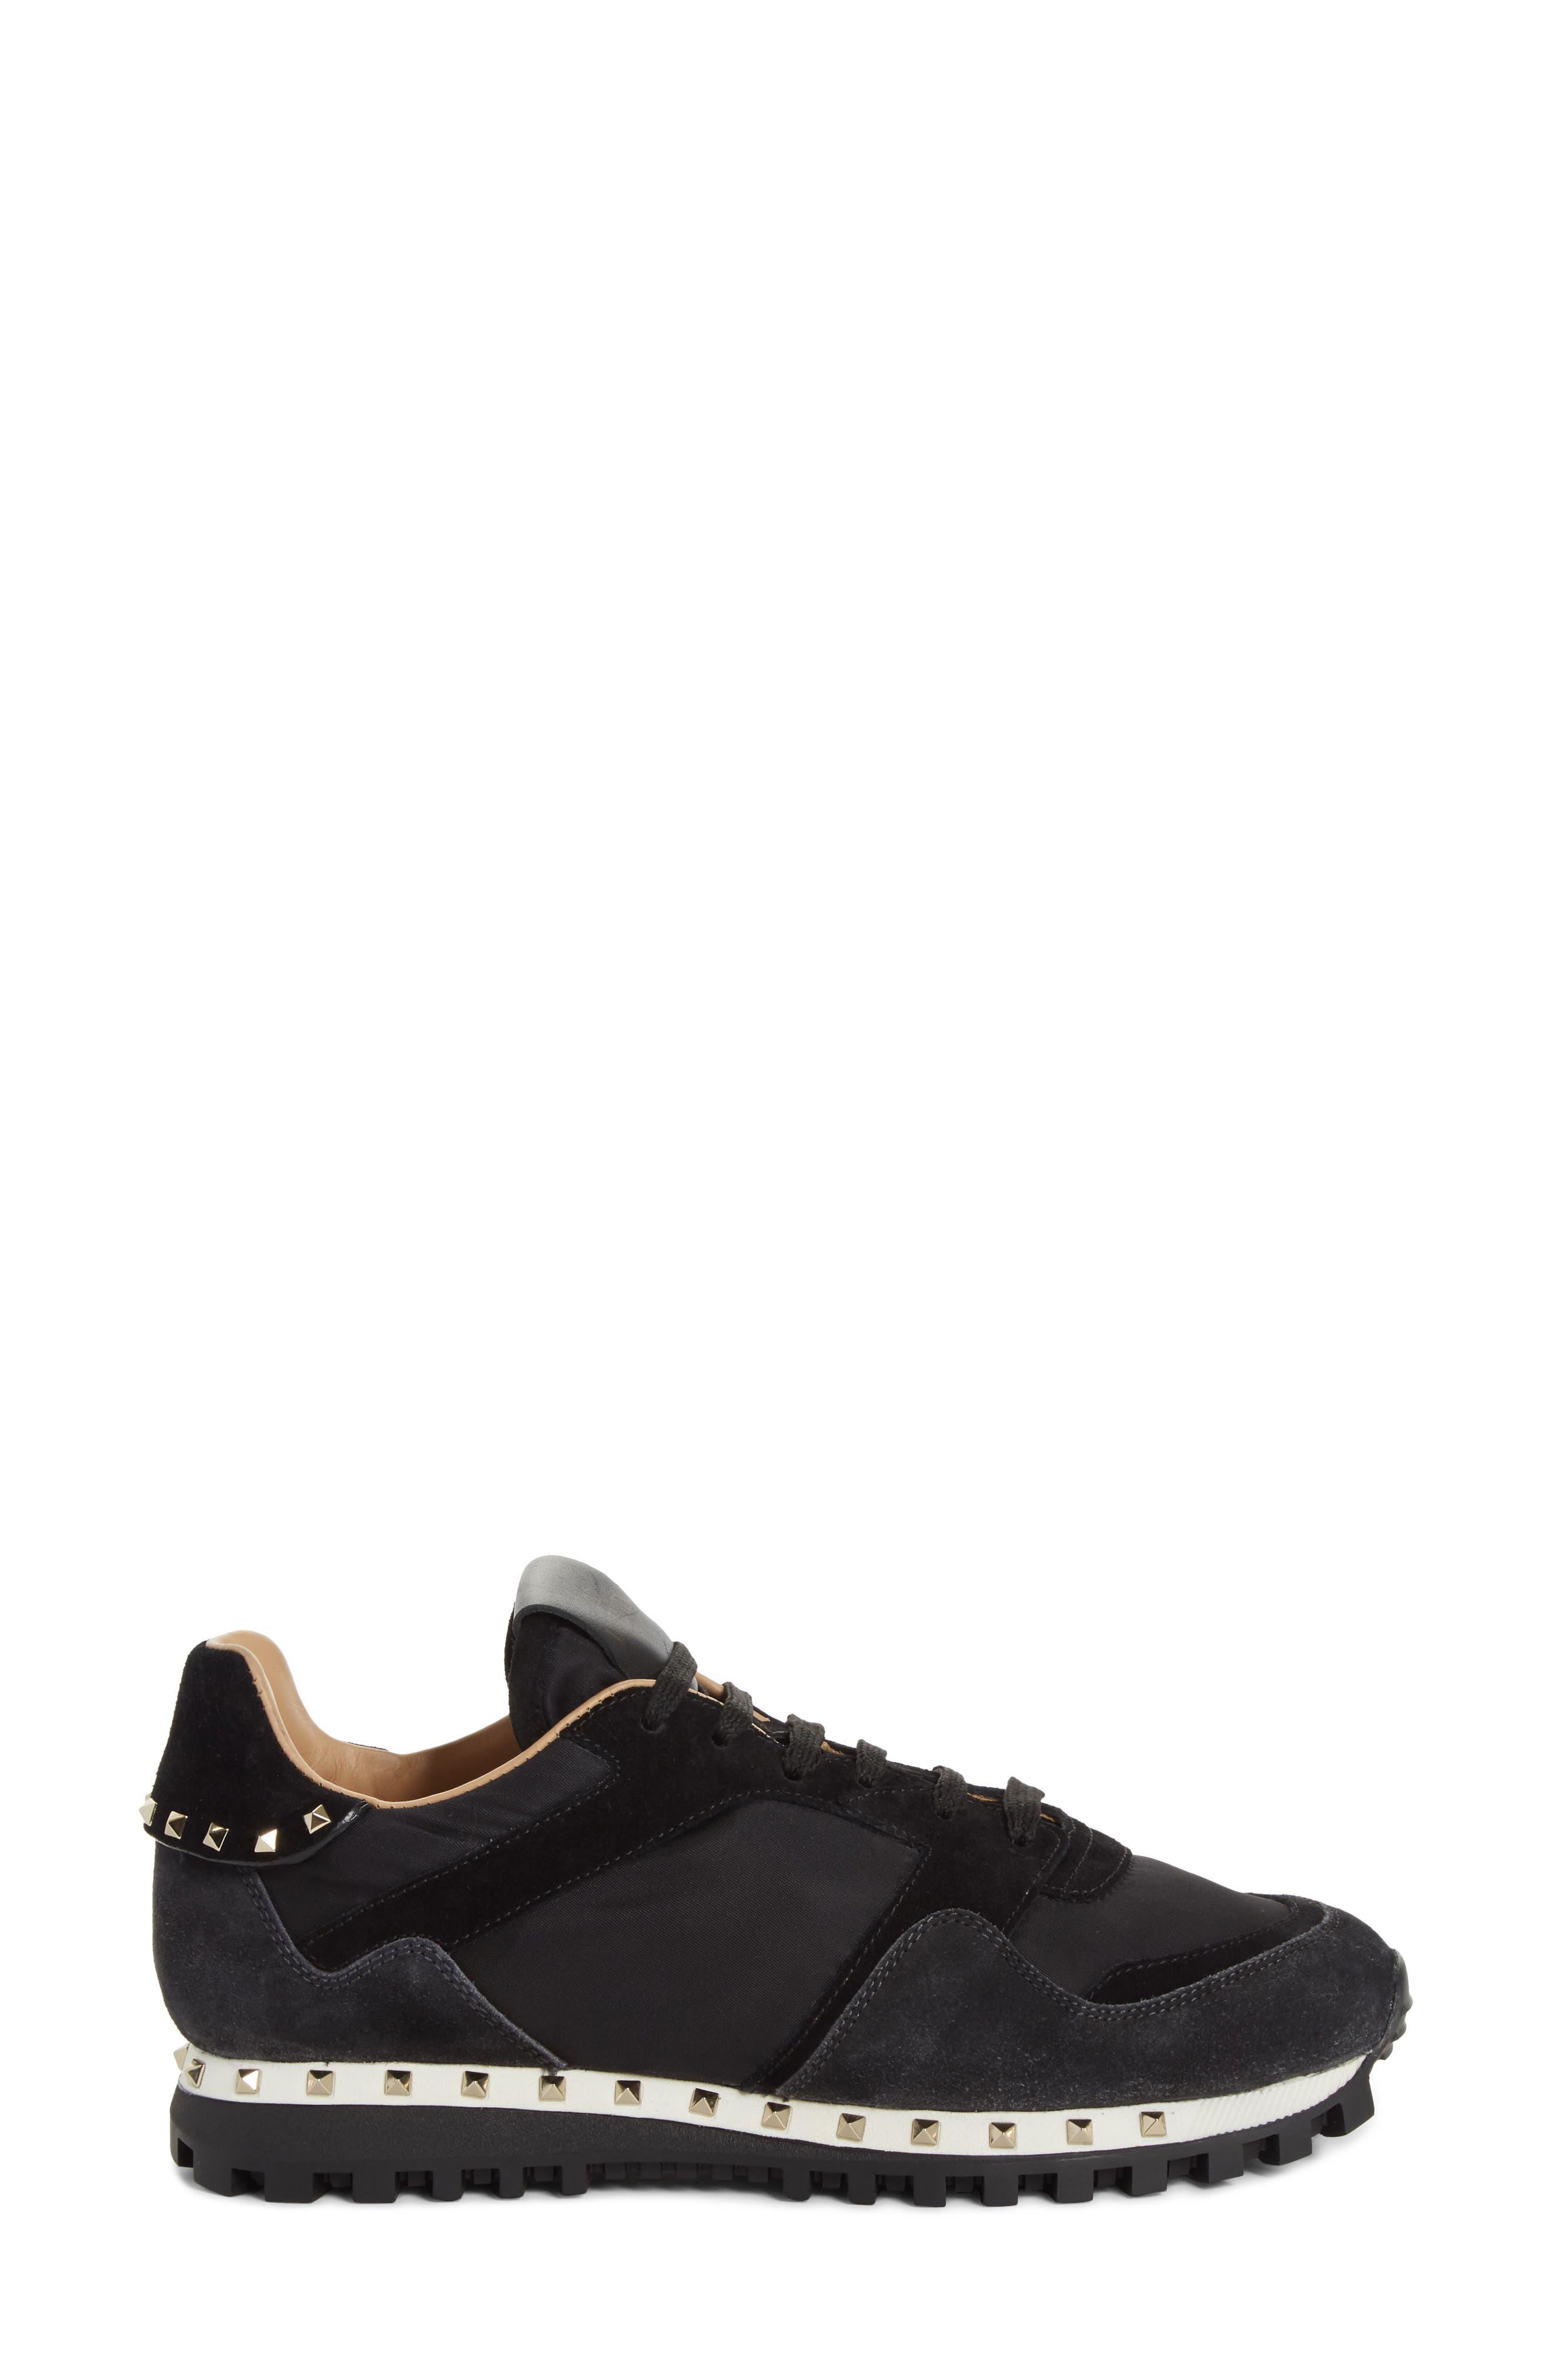 Rockstud Sneaker,                             Alternate thumbnail 3, color,                             BLACK/ GREY